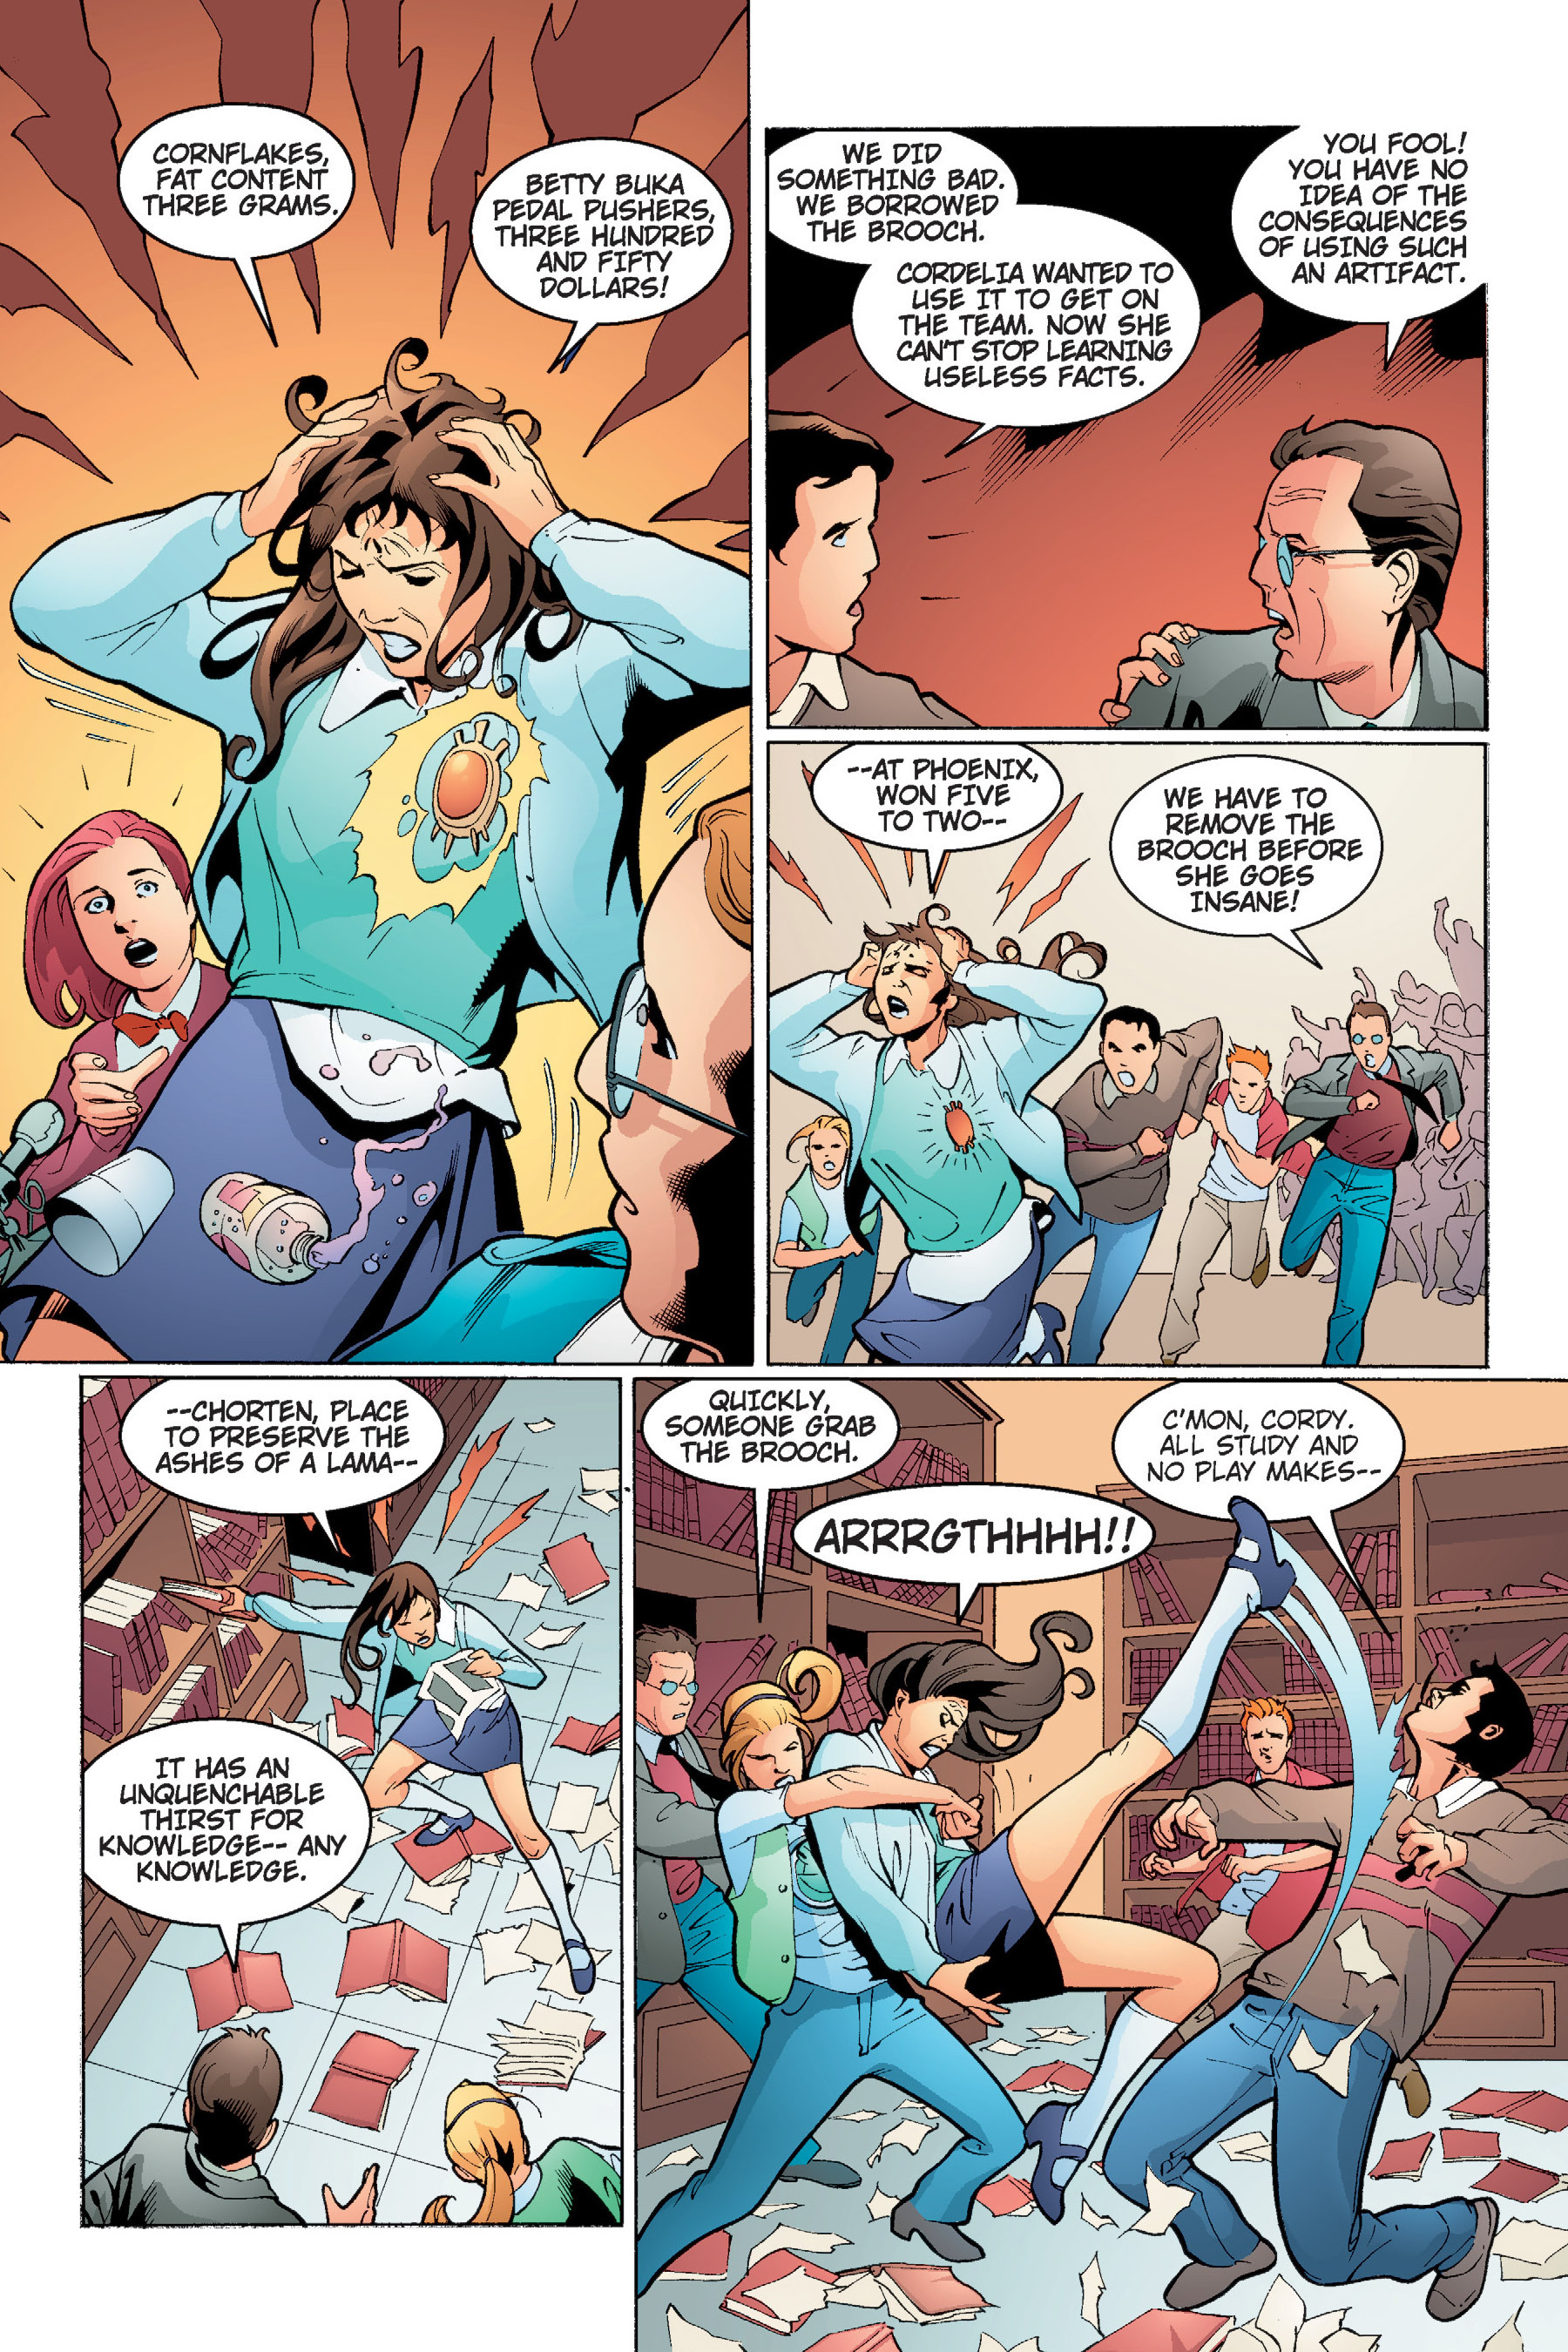 Read online Buffy the Vampire Slayer: Omnibus comic -  Issue # TPB 4 - 95